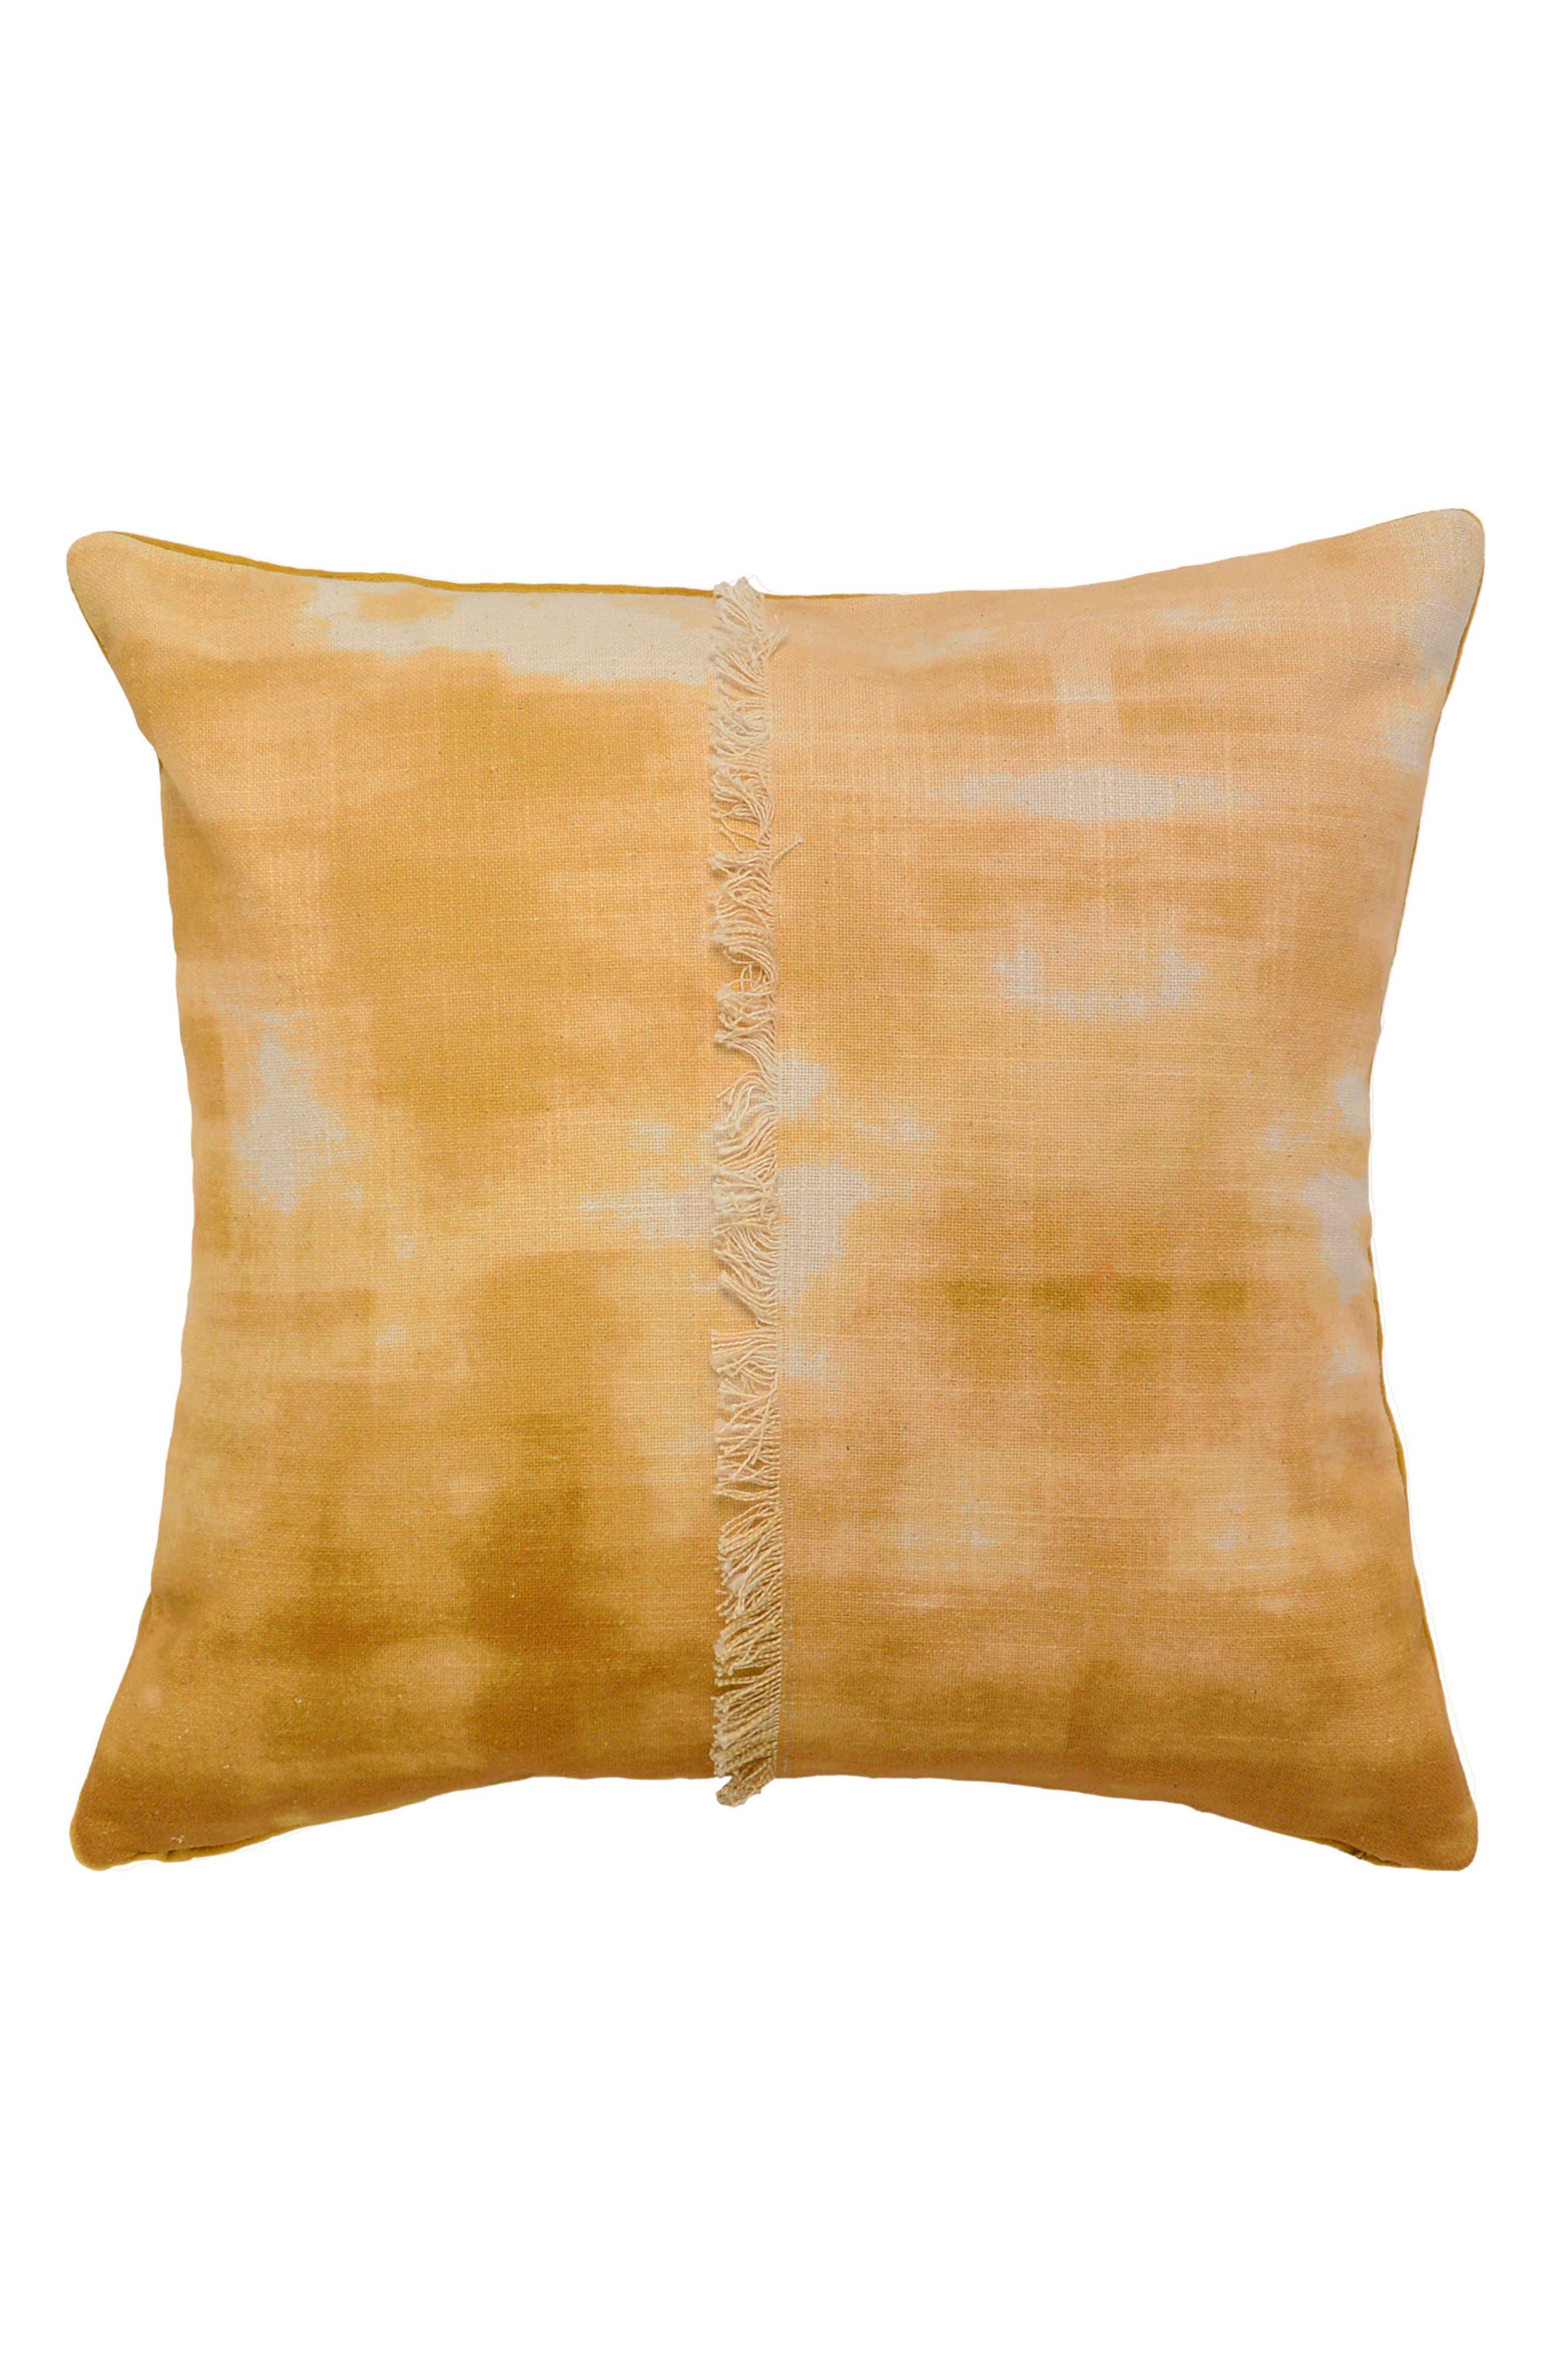 Main Image - Villa Home Collection Kino Accent Pillow